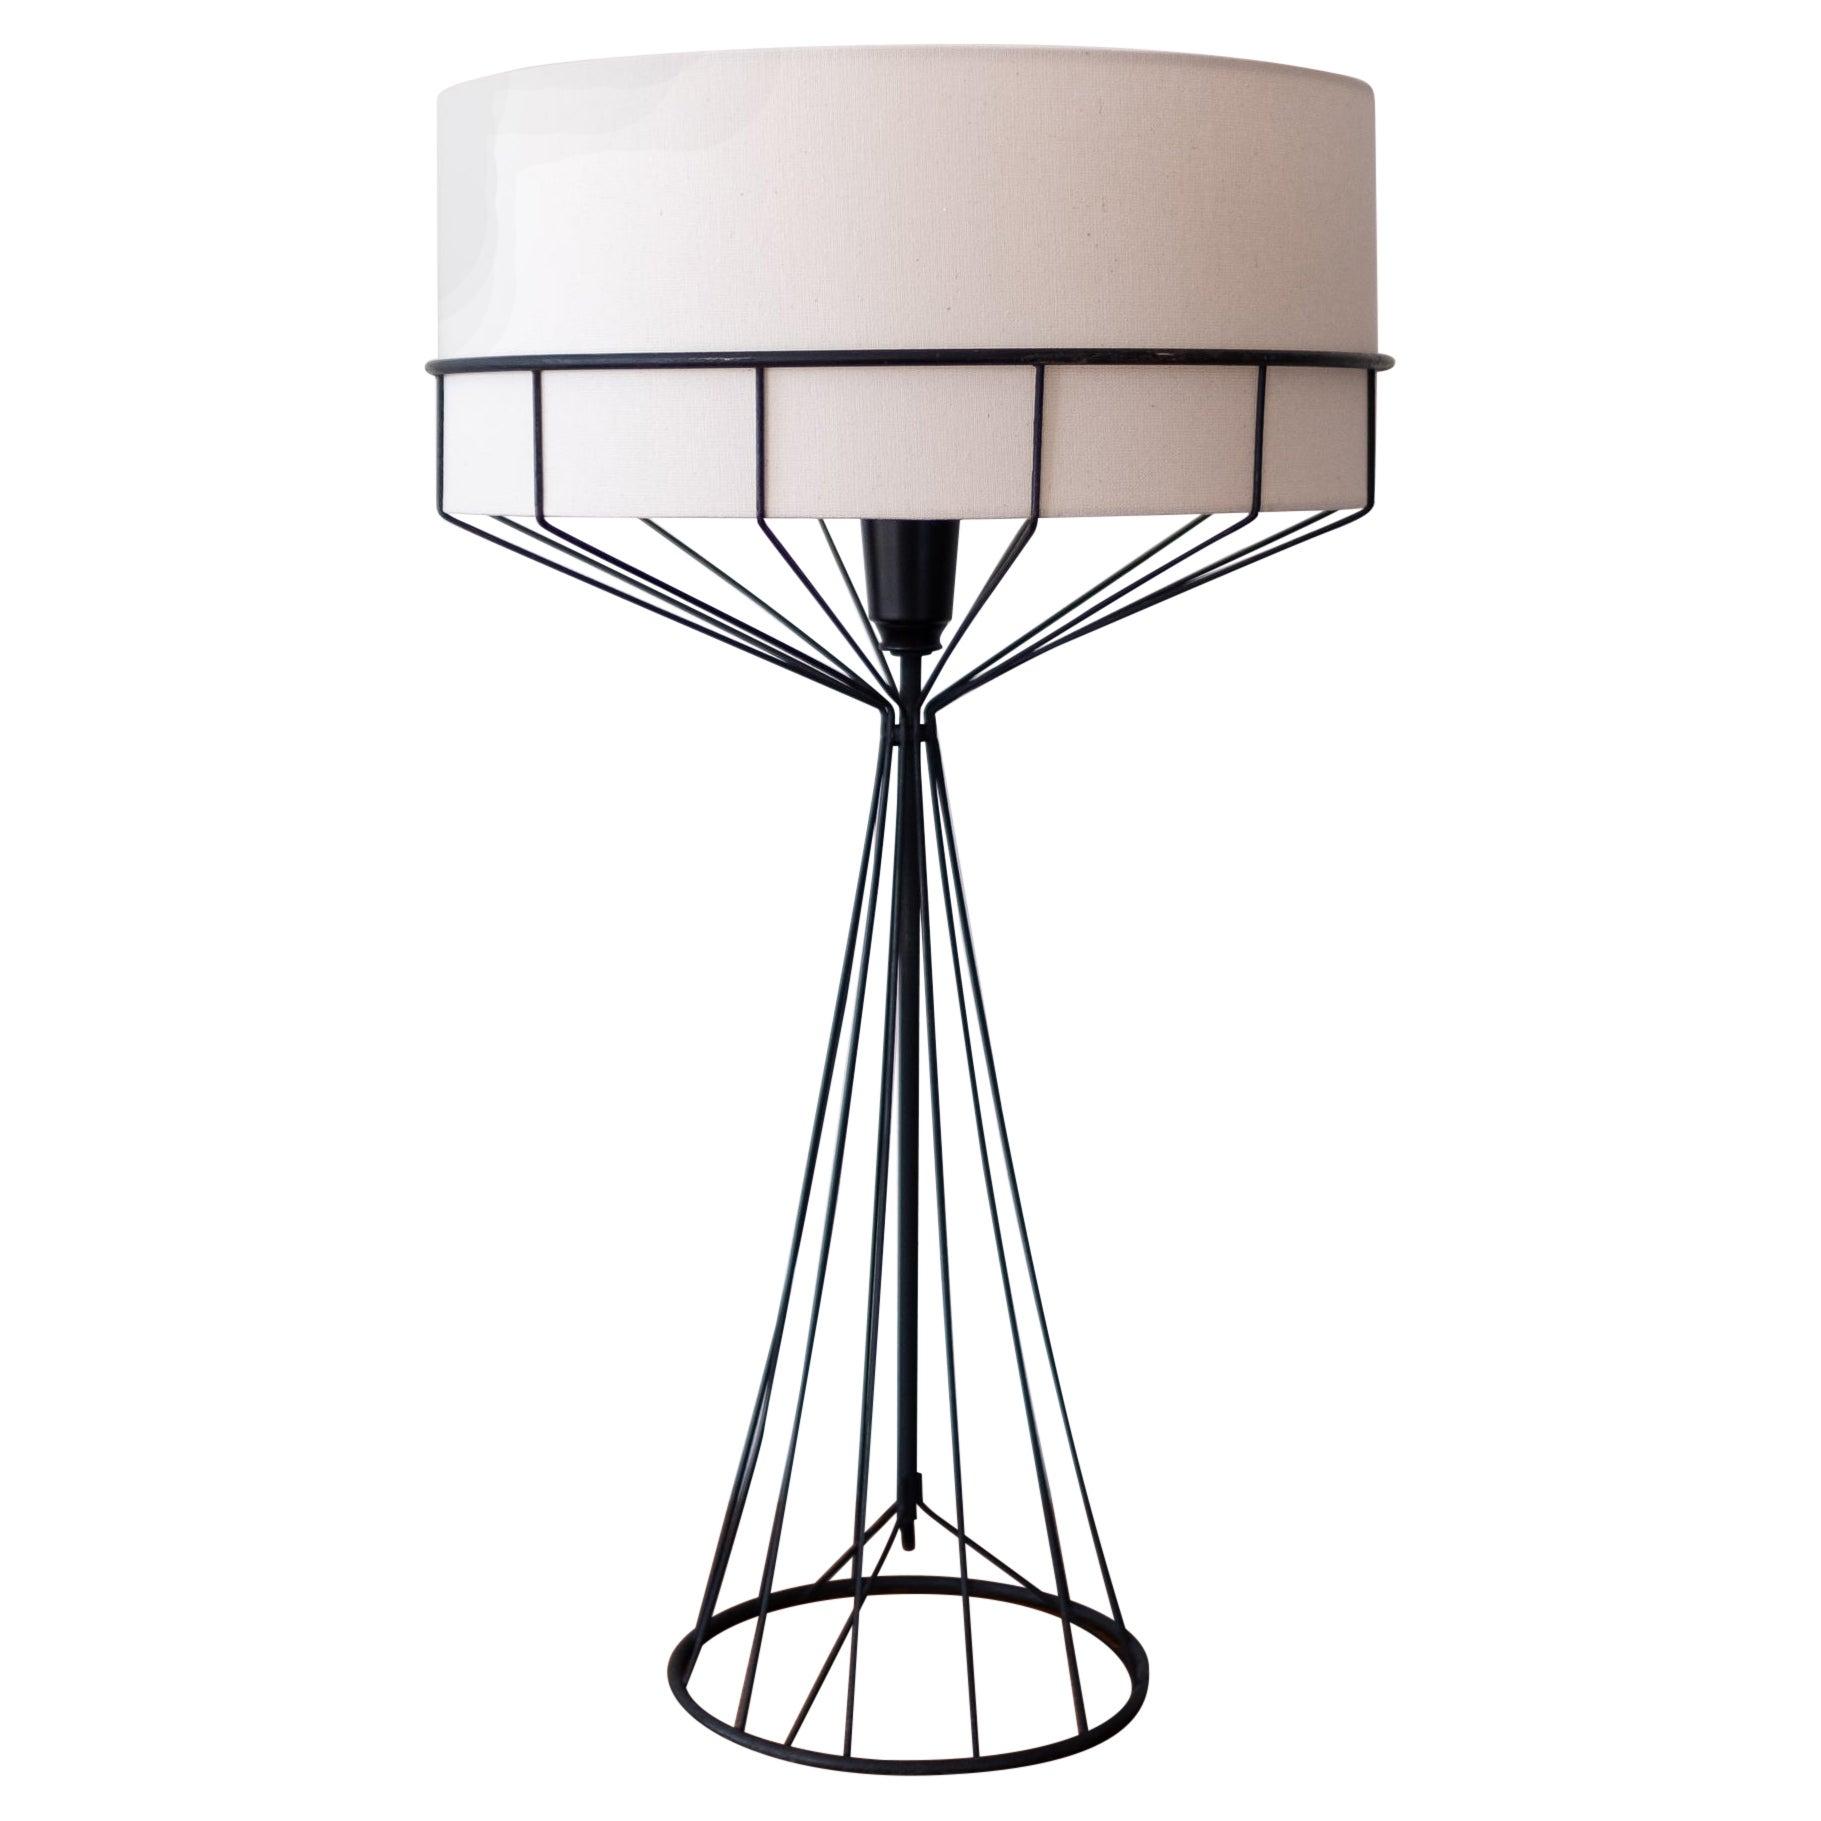 Midcentury Table Lamp by Tony Paul, 1950s